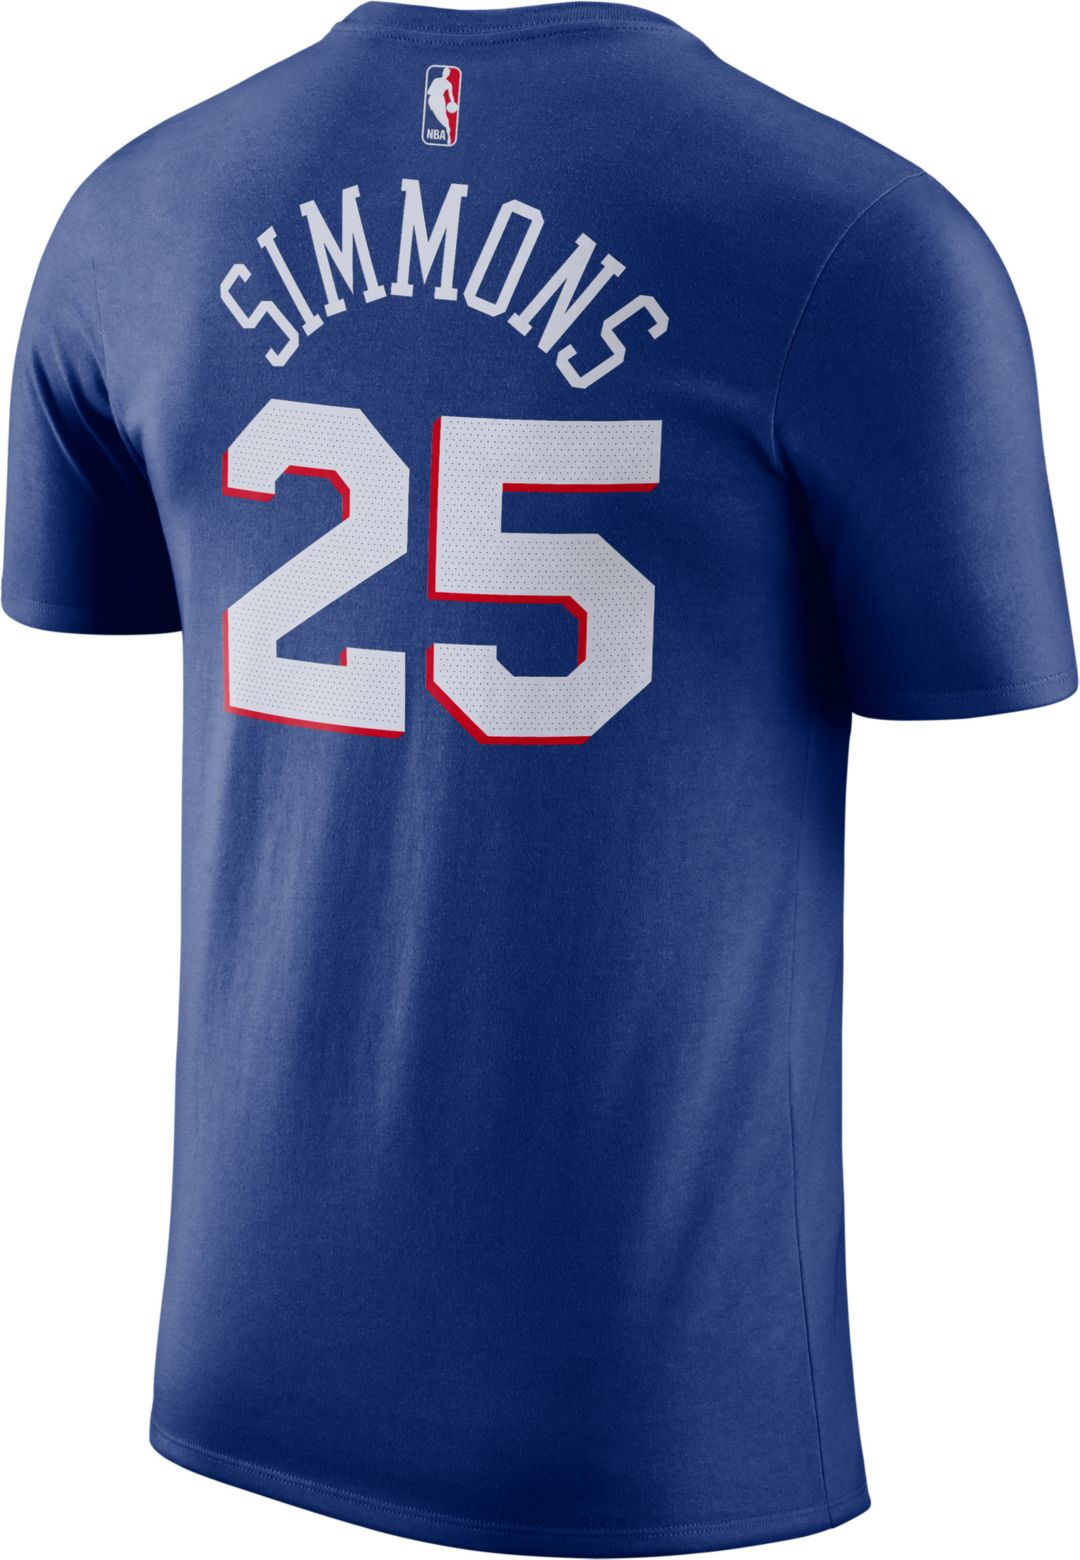 pretty nice 4bd6d c235f Nike Youth Philadelphia 76ers Ben Simmons #25 Dri-FIT Royal T-Shirt